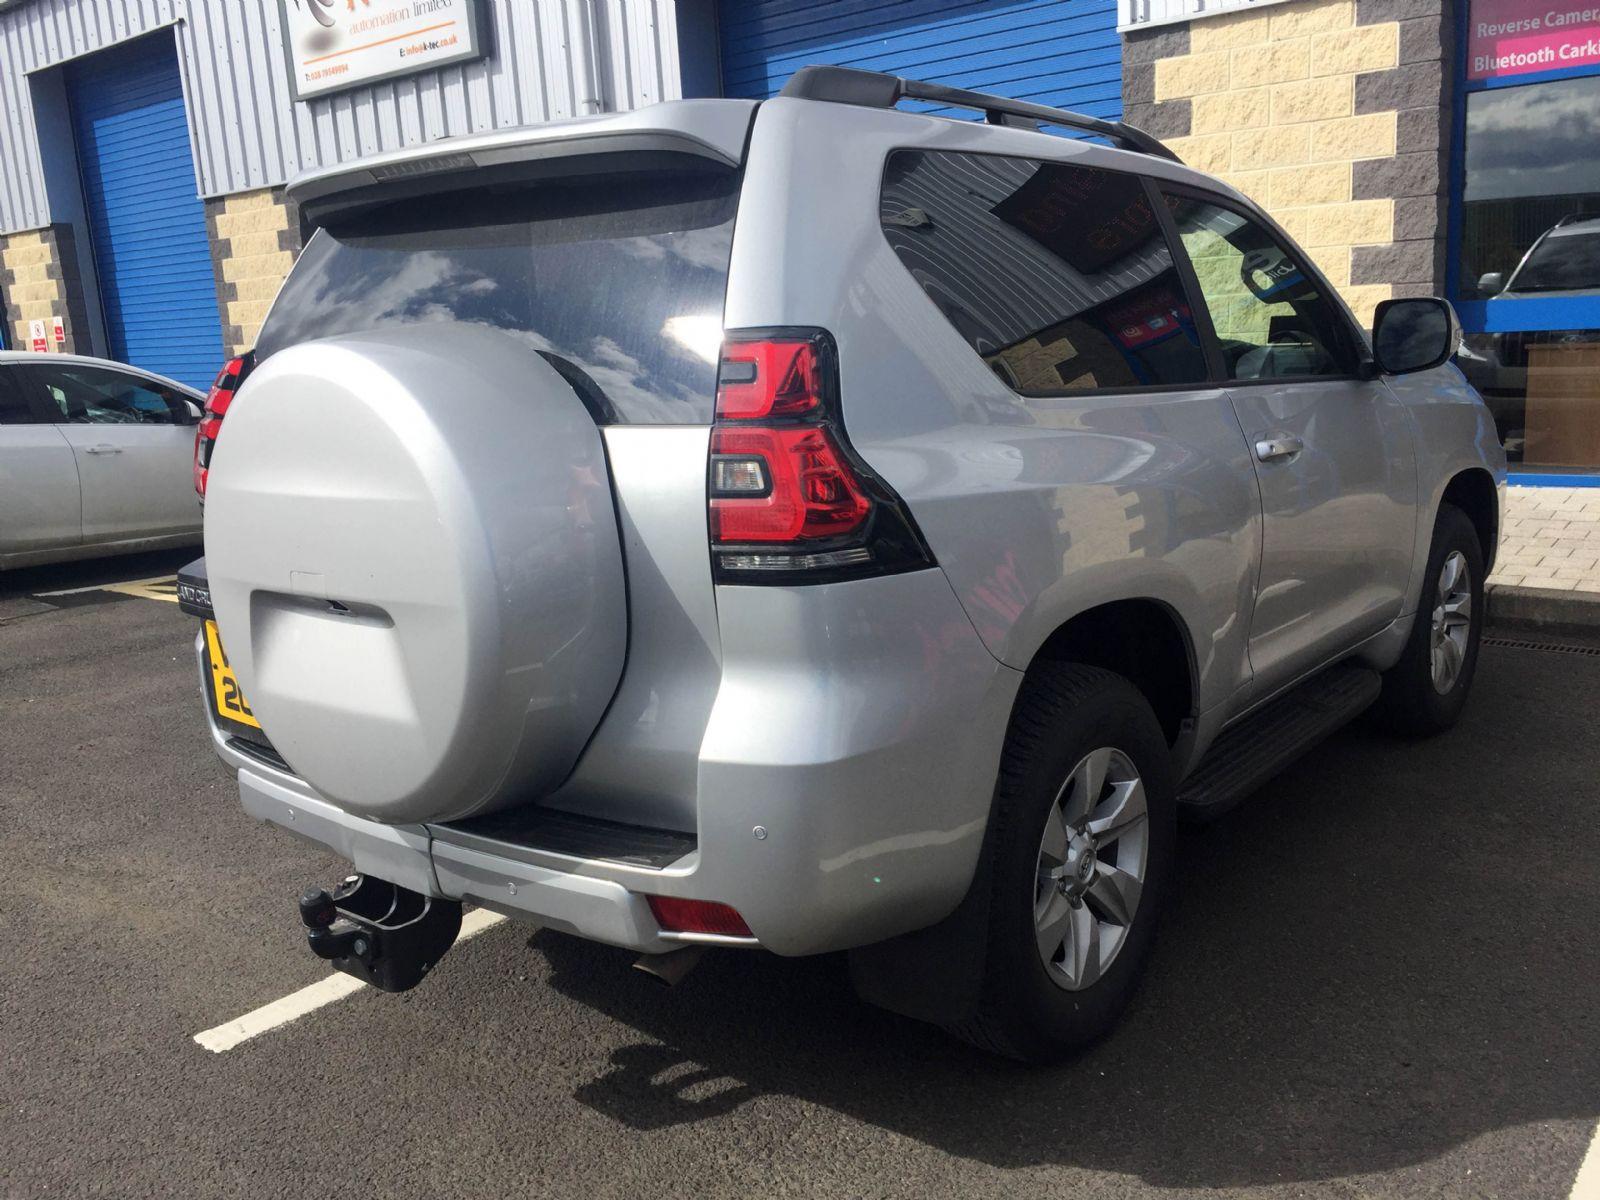 Toyota Landcruiser with back up sensors